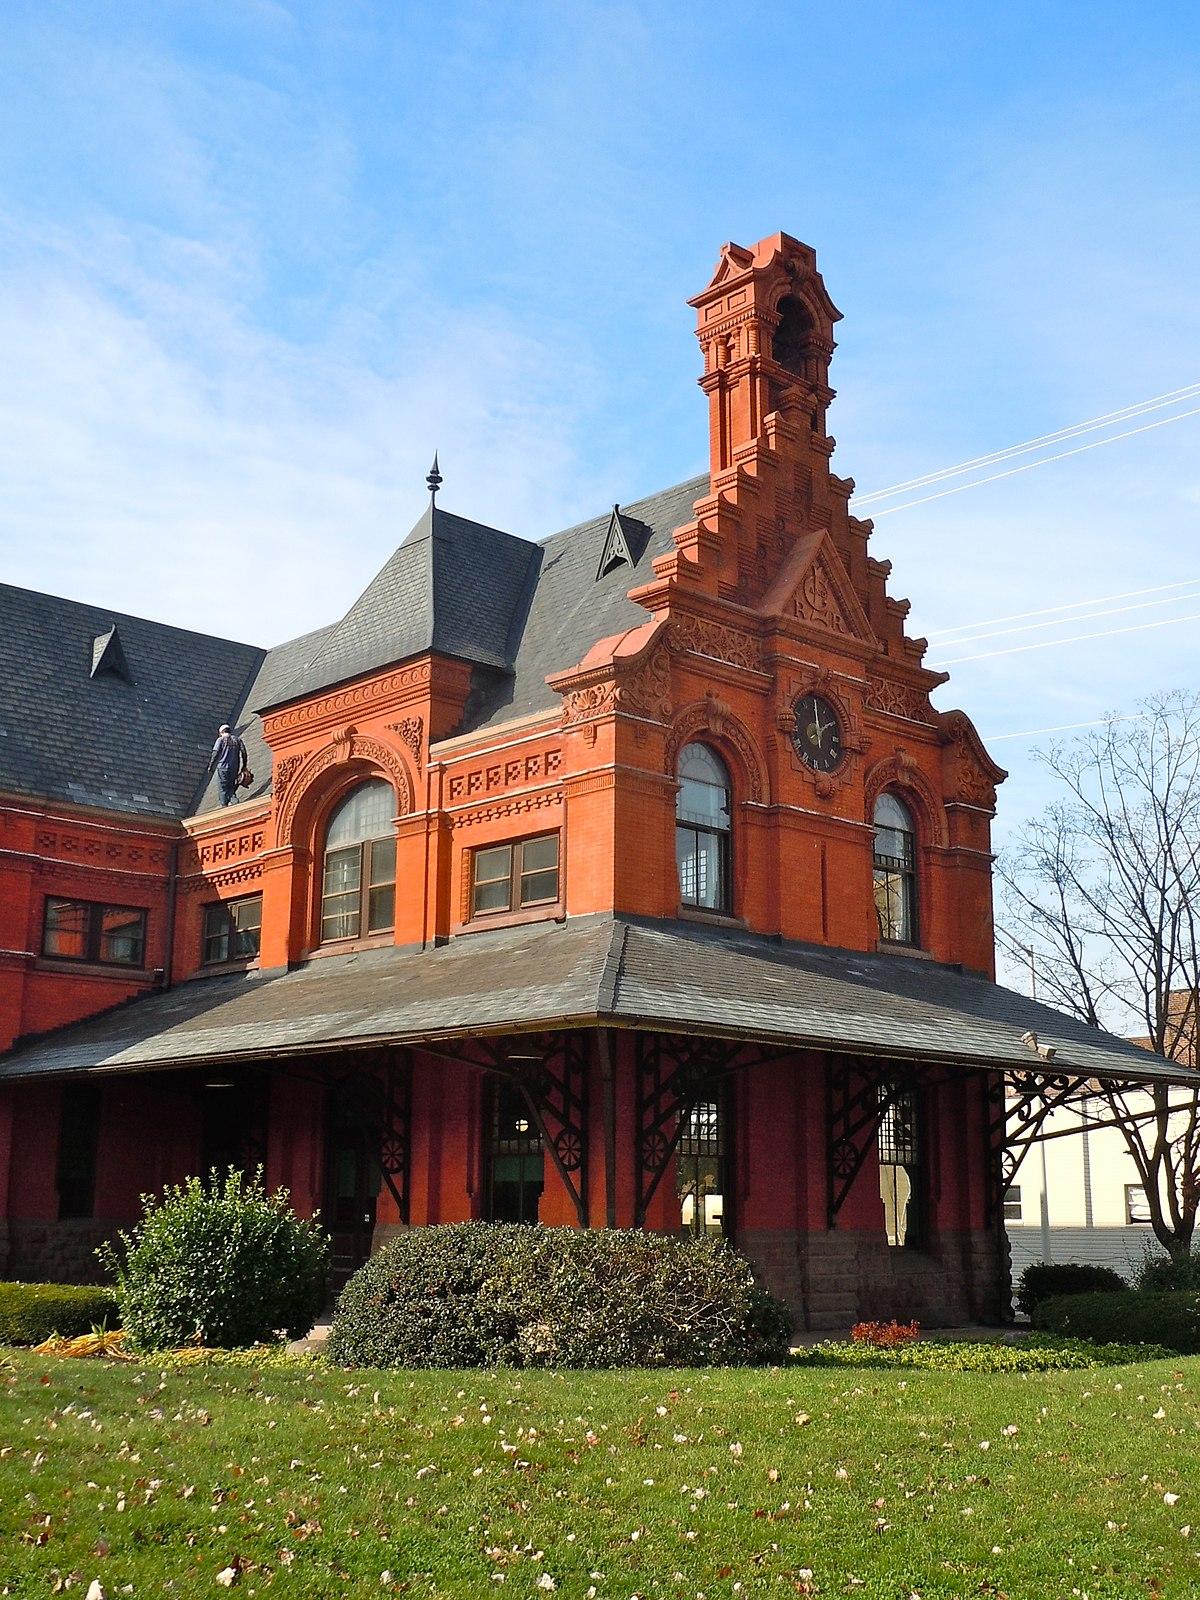 lebanon station  pennsylvania railroad